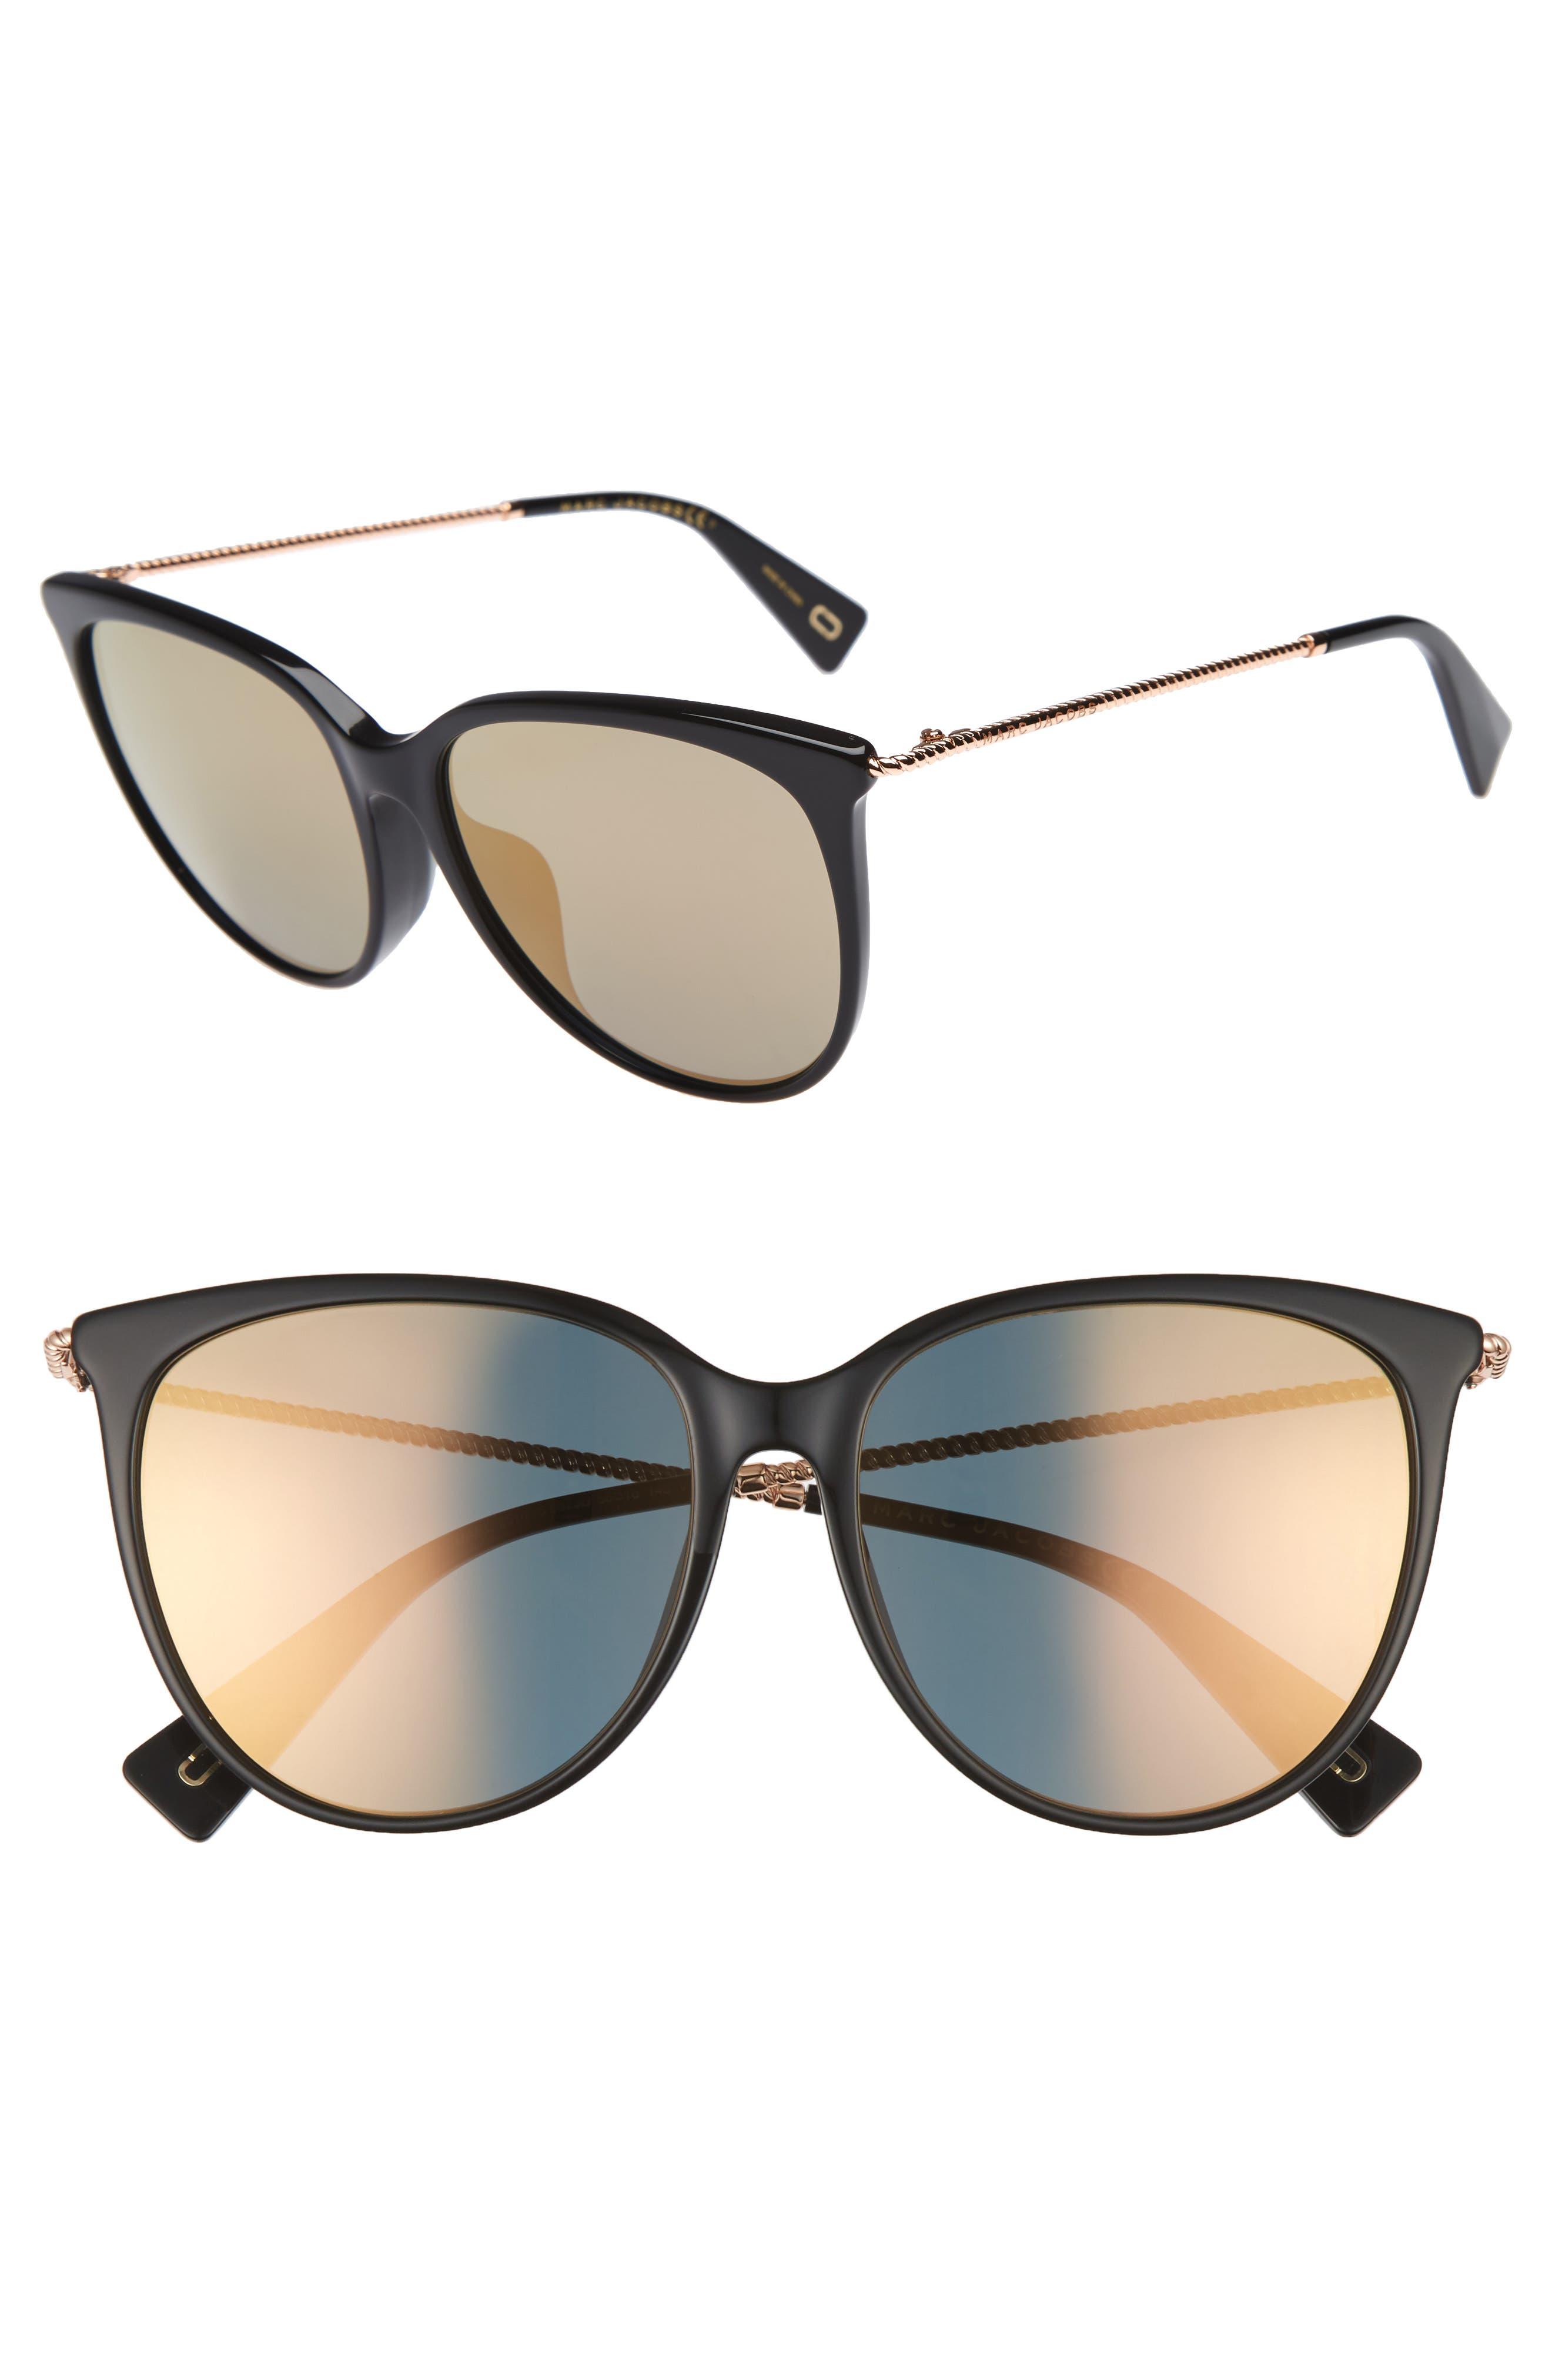 MARC JACOBS,                             56mm Cat Eye Sunglasses,                             Main thumbnail 1, color,                             001